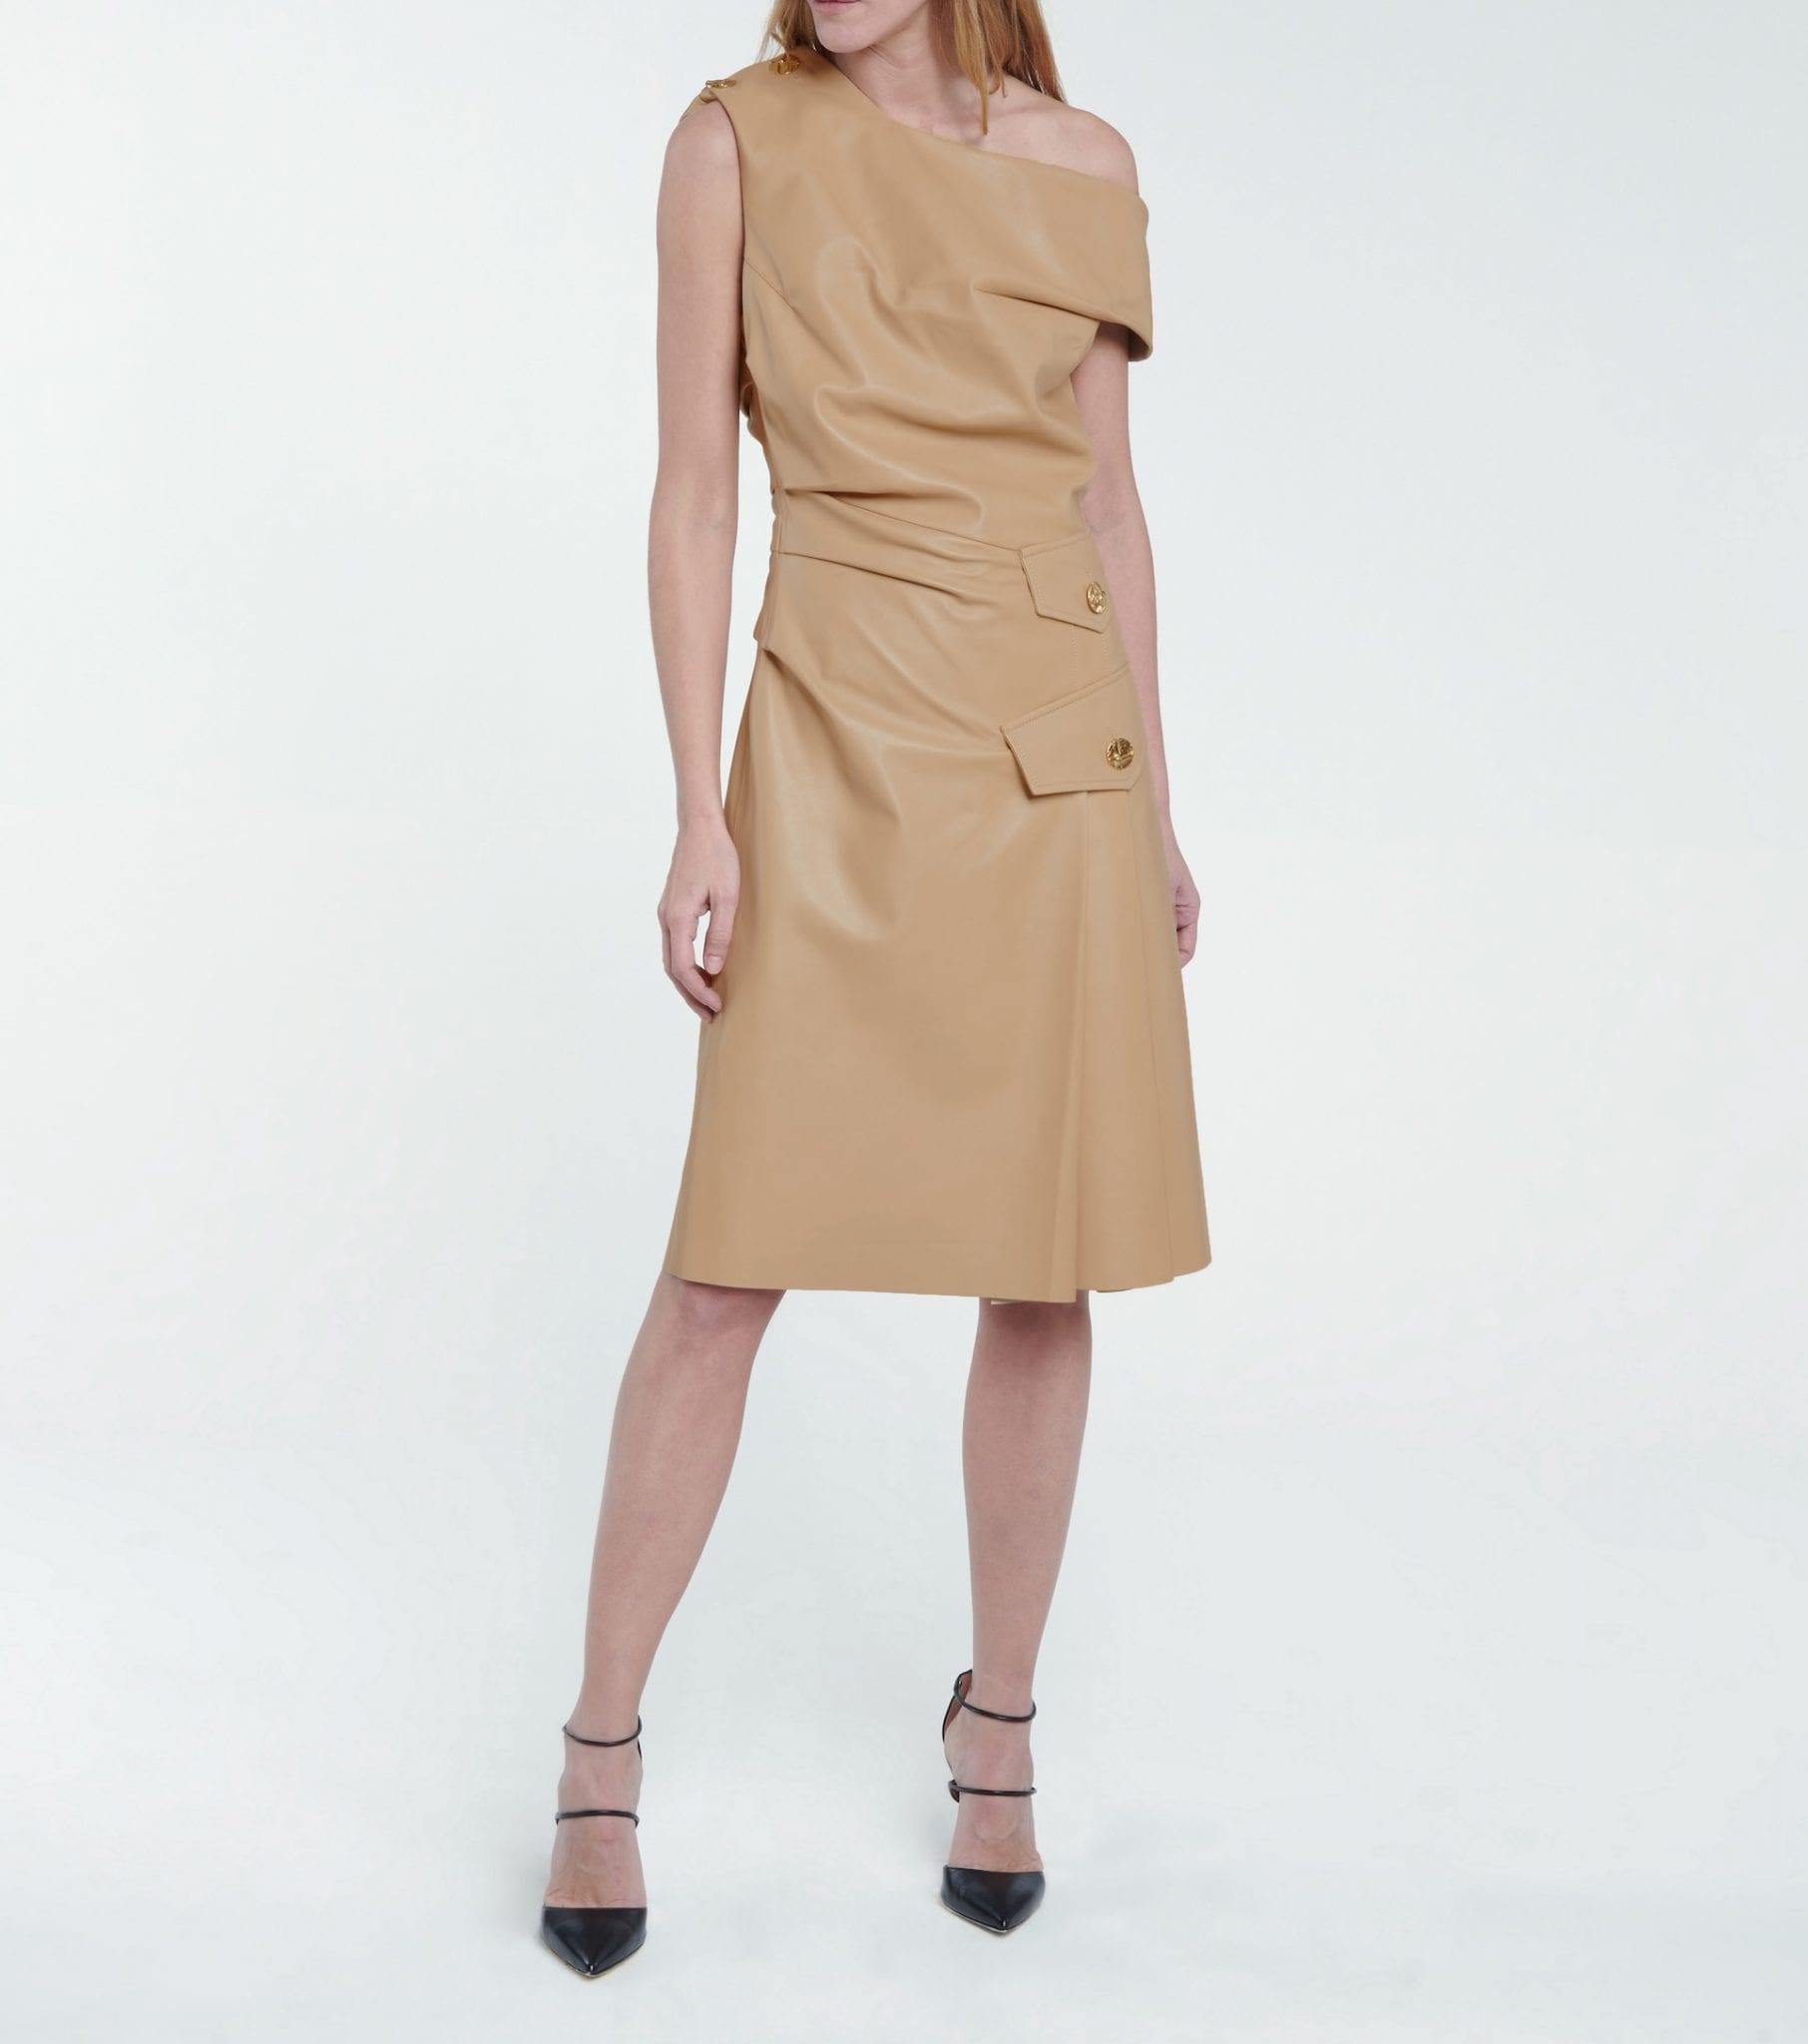 PROENZA SCHOULER One-shoulder Leather Mini Dress